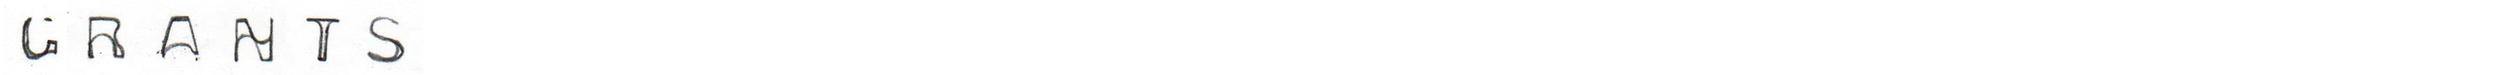 2018 Iaspis - The Swedish Arts Grants Committee's International Programme for Visual and Applied Artists 2018-2020 Stockholms stads ateljéstöd 2017 Iaspis - The Swedish Arts Grants Committee's International Programme for Visual and Applied Artists 2016 Westerlunds minnesfond 2016 Estrid Ericsons stiftelse 2015-2017 Stockholms stads ateljéstöd 2014 Westerlunds minnesfond 2014 Iaspis - The Swedish Arts Grants Committee's International Programme for Visual and Applied Artists 2013 Stiftelsen August Ringnérs stipendiefond 2012 Fabrikör J.L. Eklunds hantverksstipendium 2011 Norske kunsthåndverkere 2008 Jönköpings borgarekassa och bjuggska fonden 2008 Estrid Ericsons stiftelse 2007 Jönköpings borgarekassa och bjuggska fonden 2007 Skommarviktors stipendium